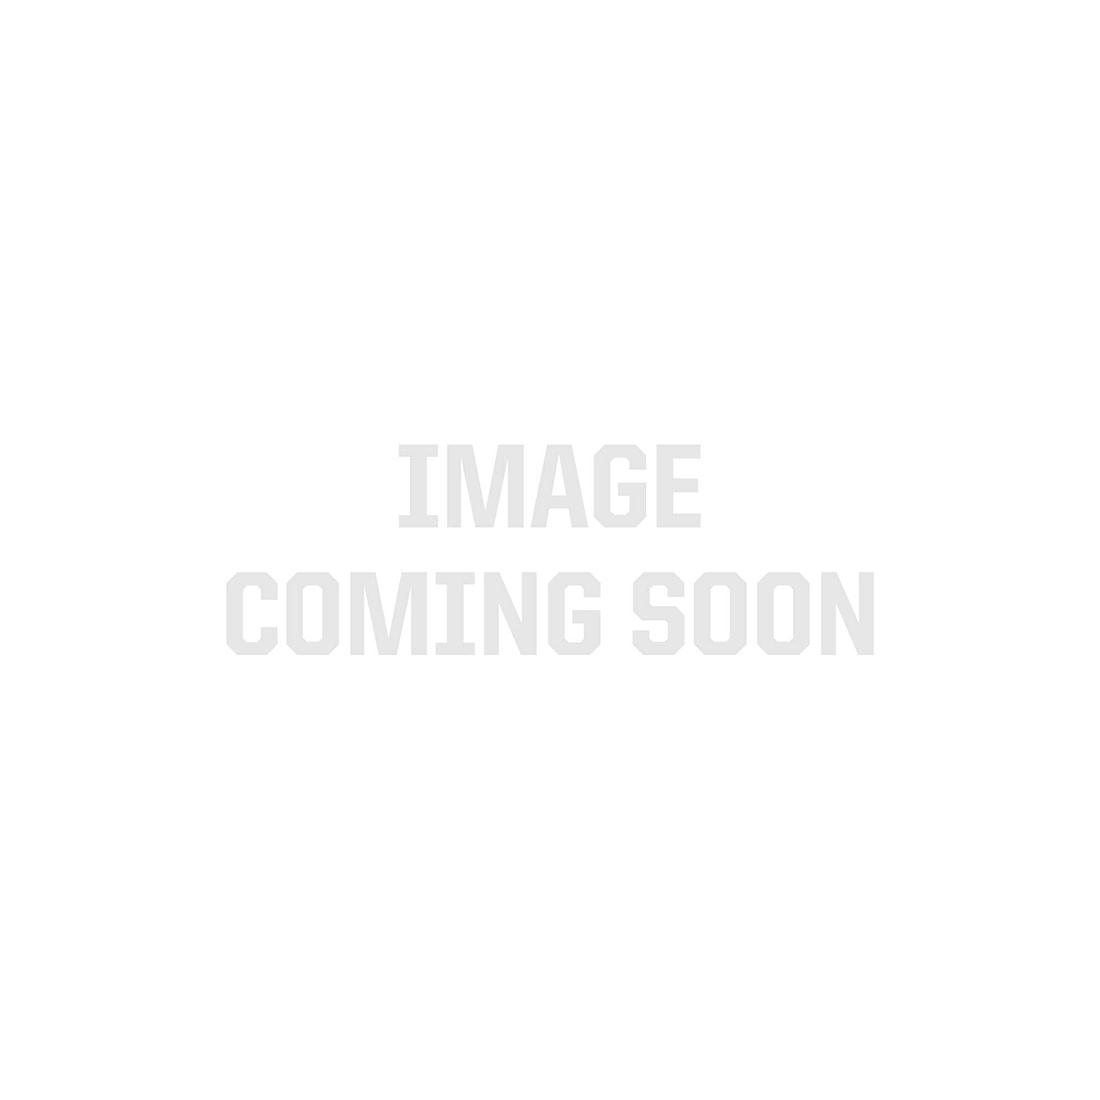 Espen Ultron VEV8024MVHDA-10V-24 80W 24V Output Dimmable LED Driver (0-10V)